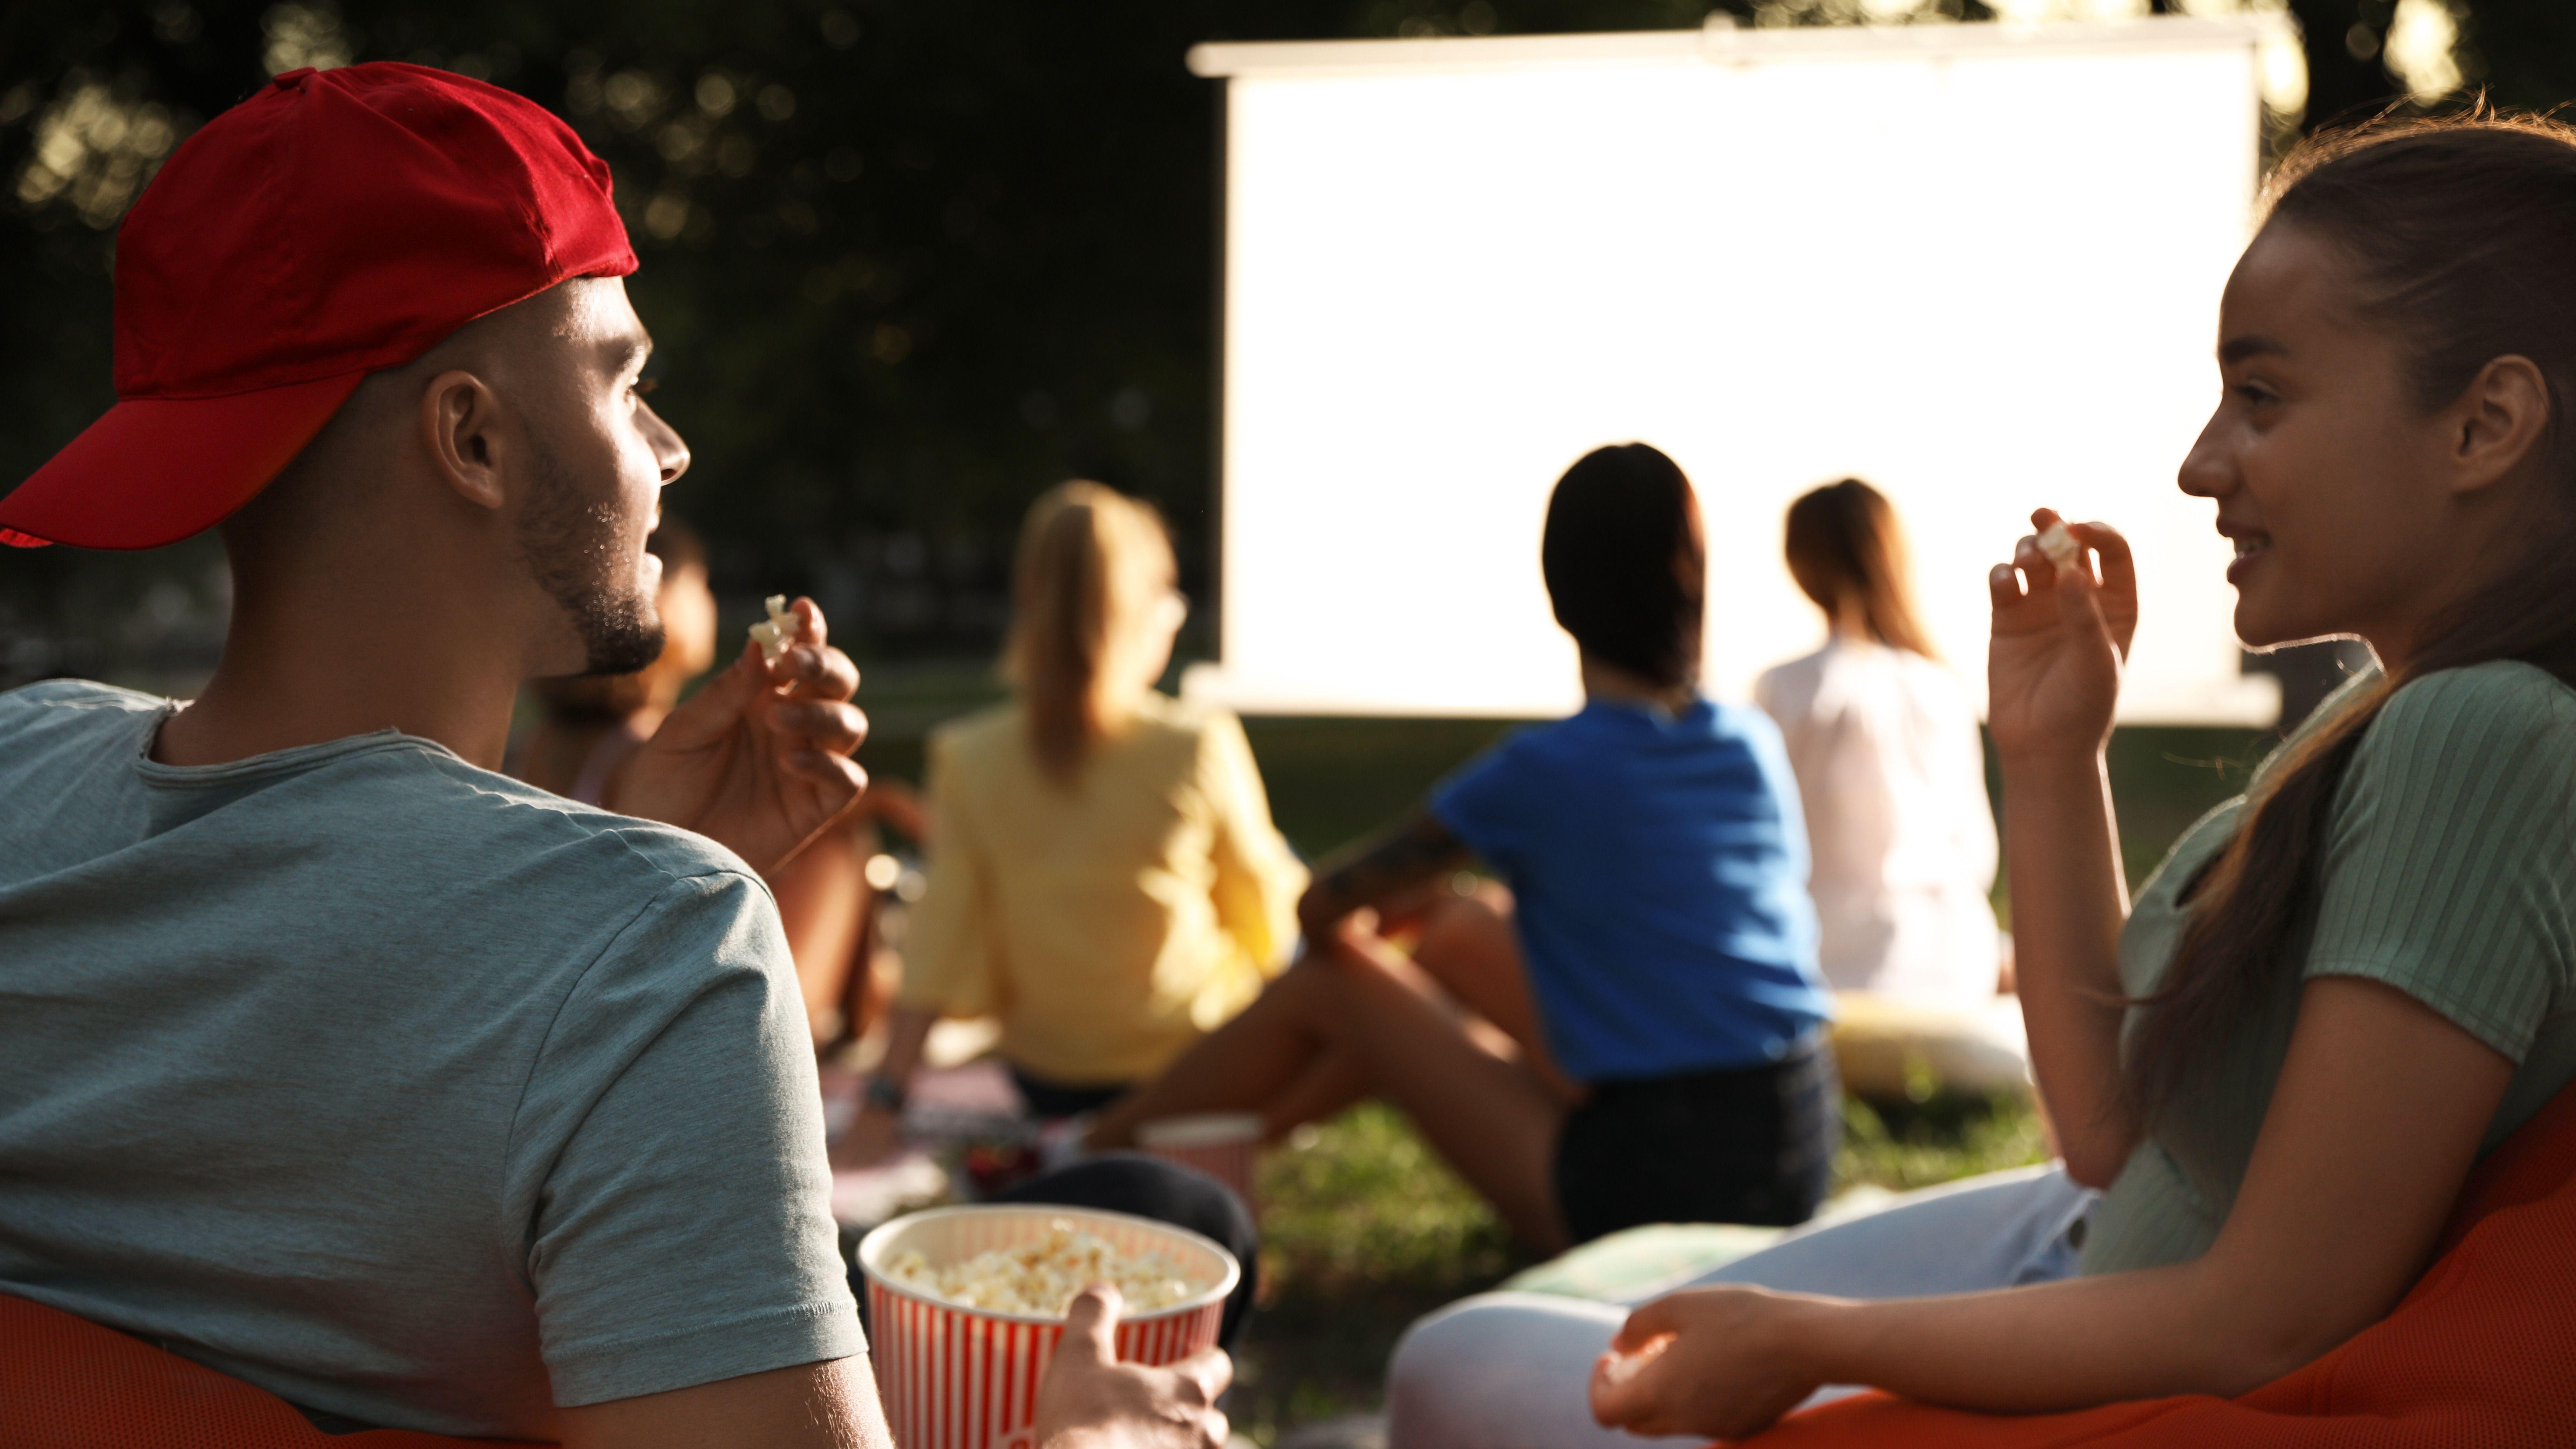 A1 / A2 cinematic meet&read in der Sprachschule Edeltraud